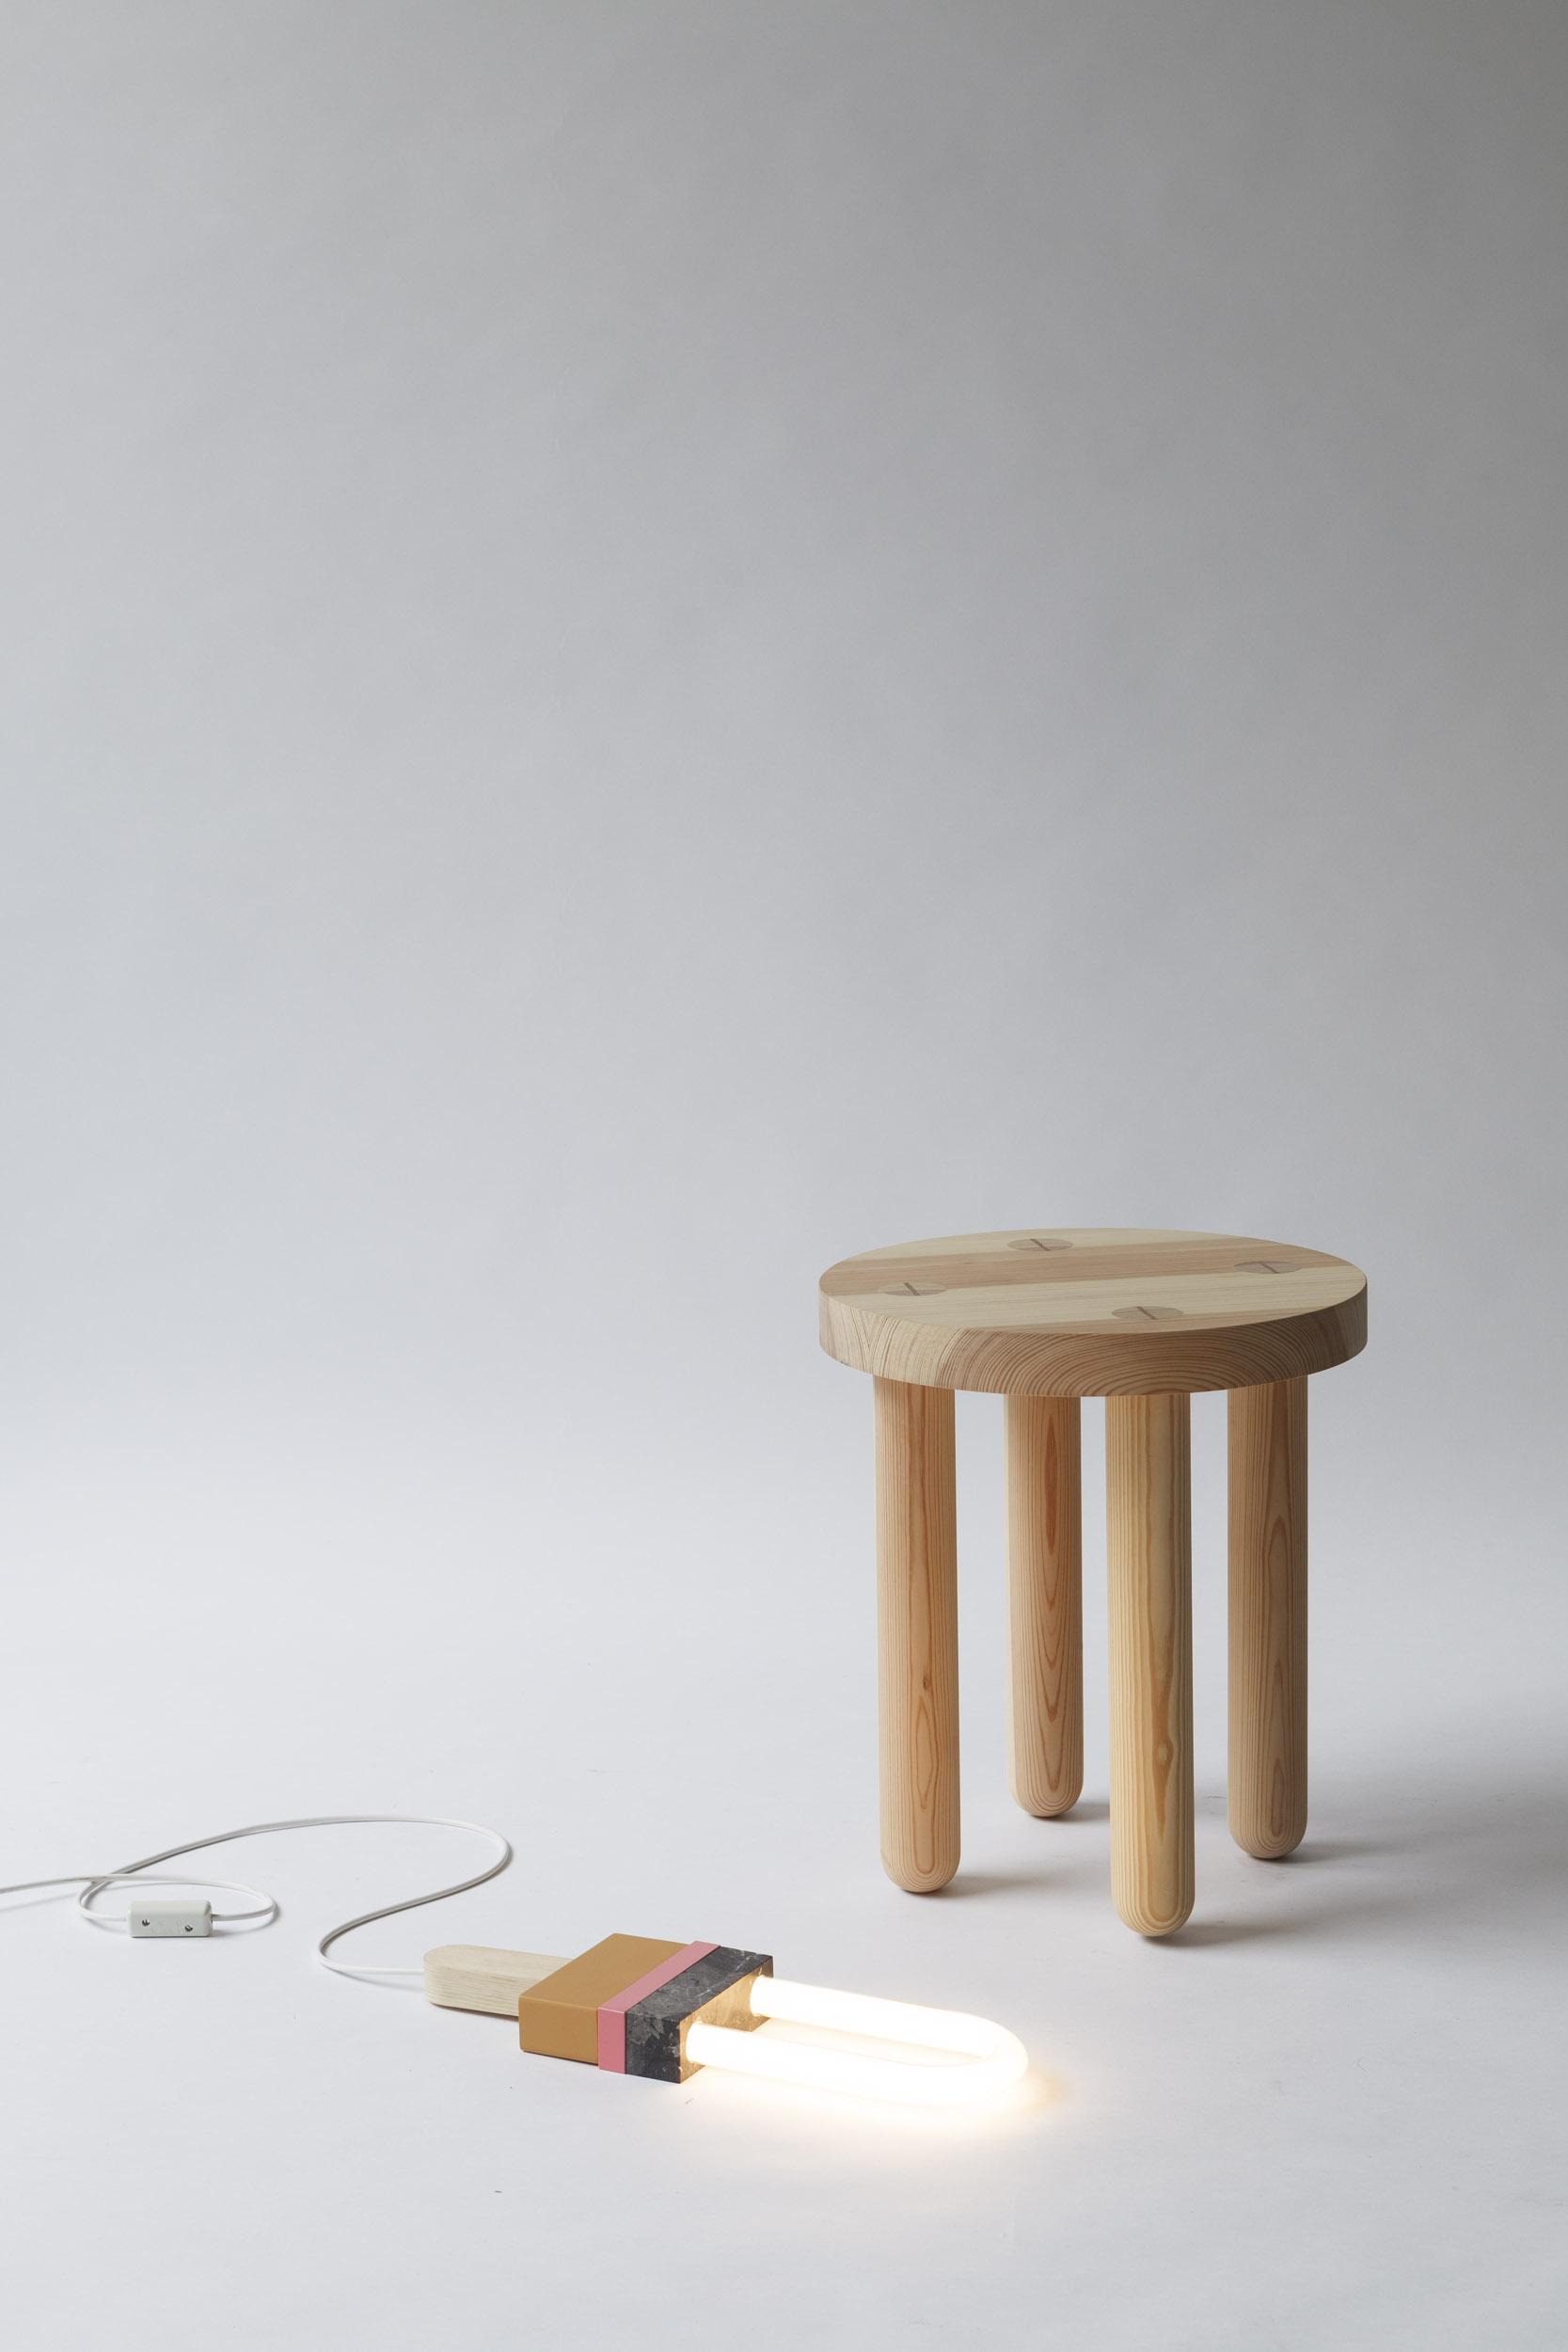 STOOL DOT DOT,  SOLID WOOD, OILED  40 x 40 x 45cm